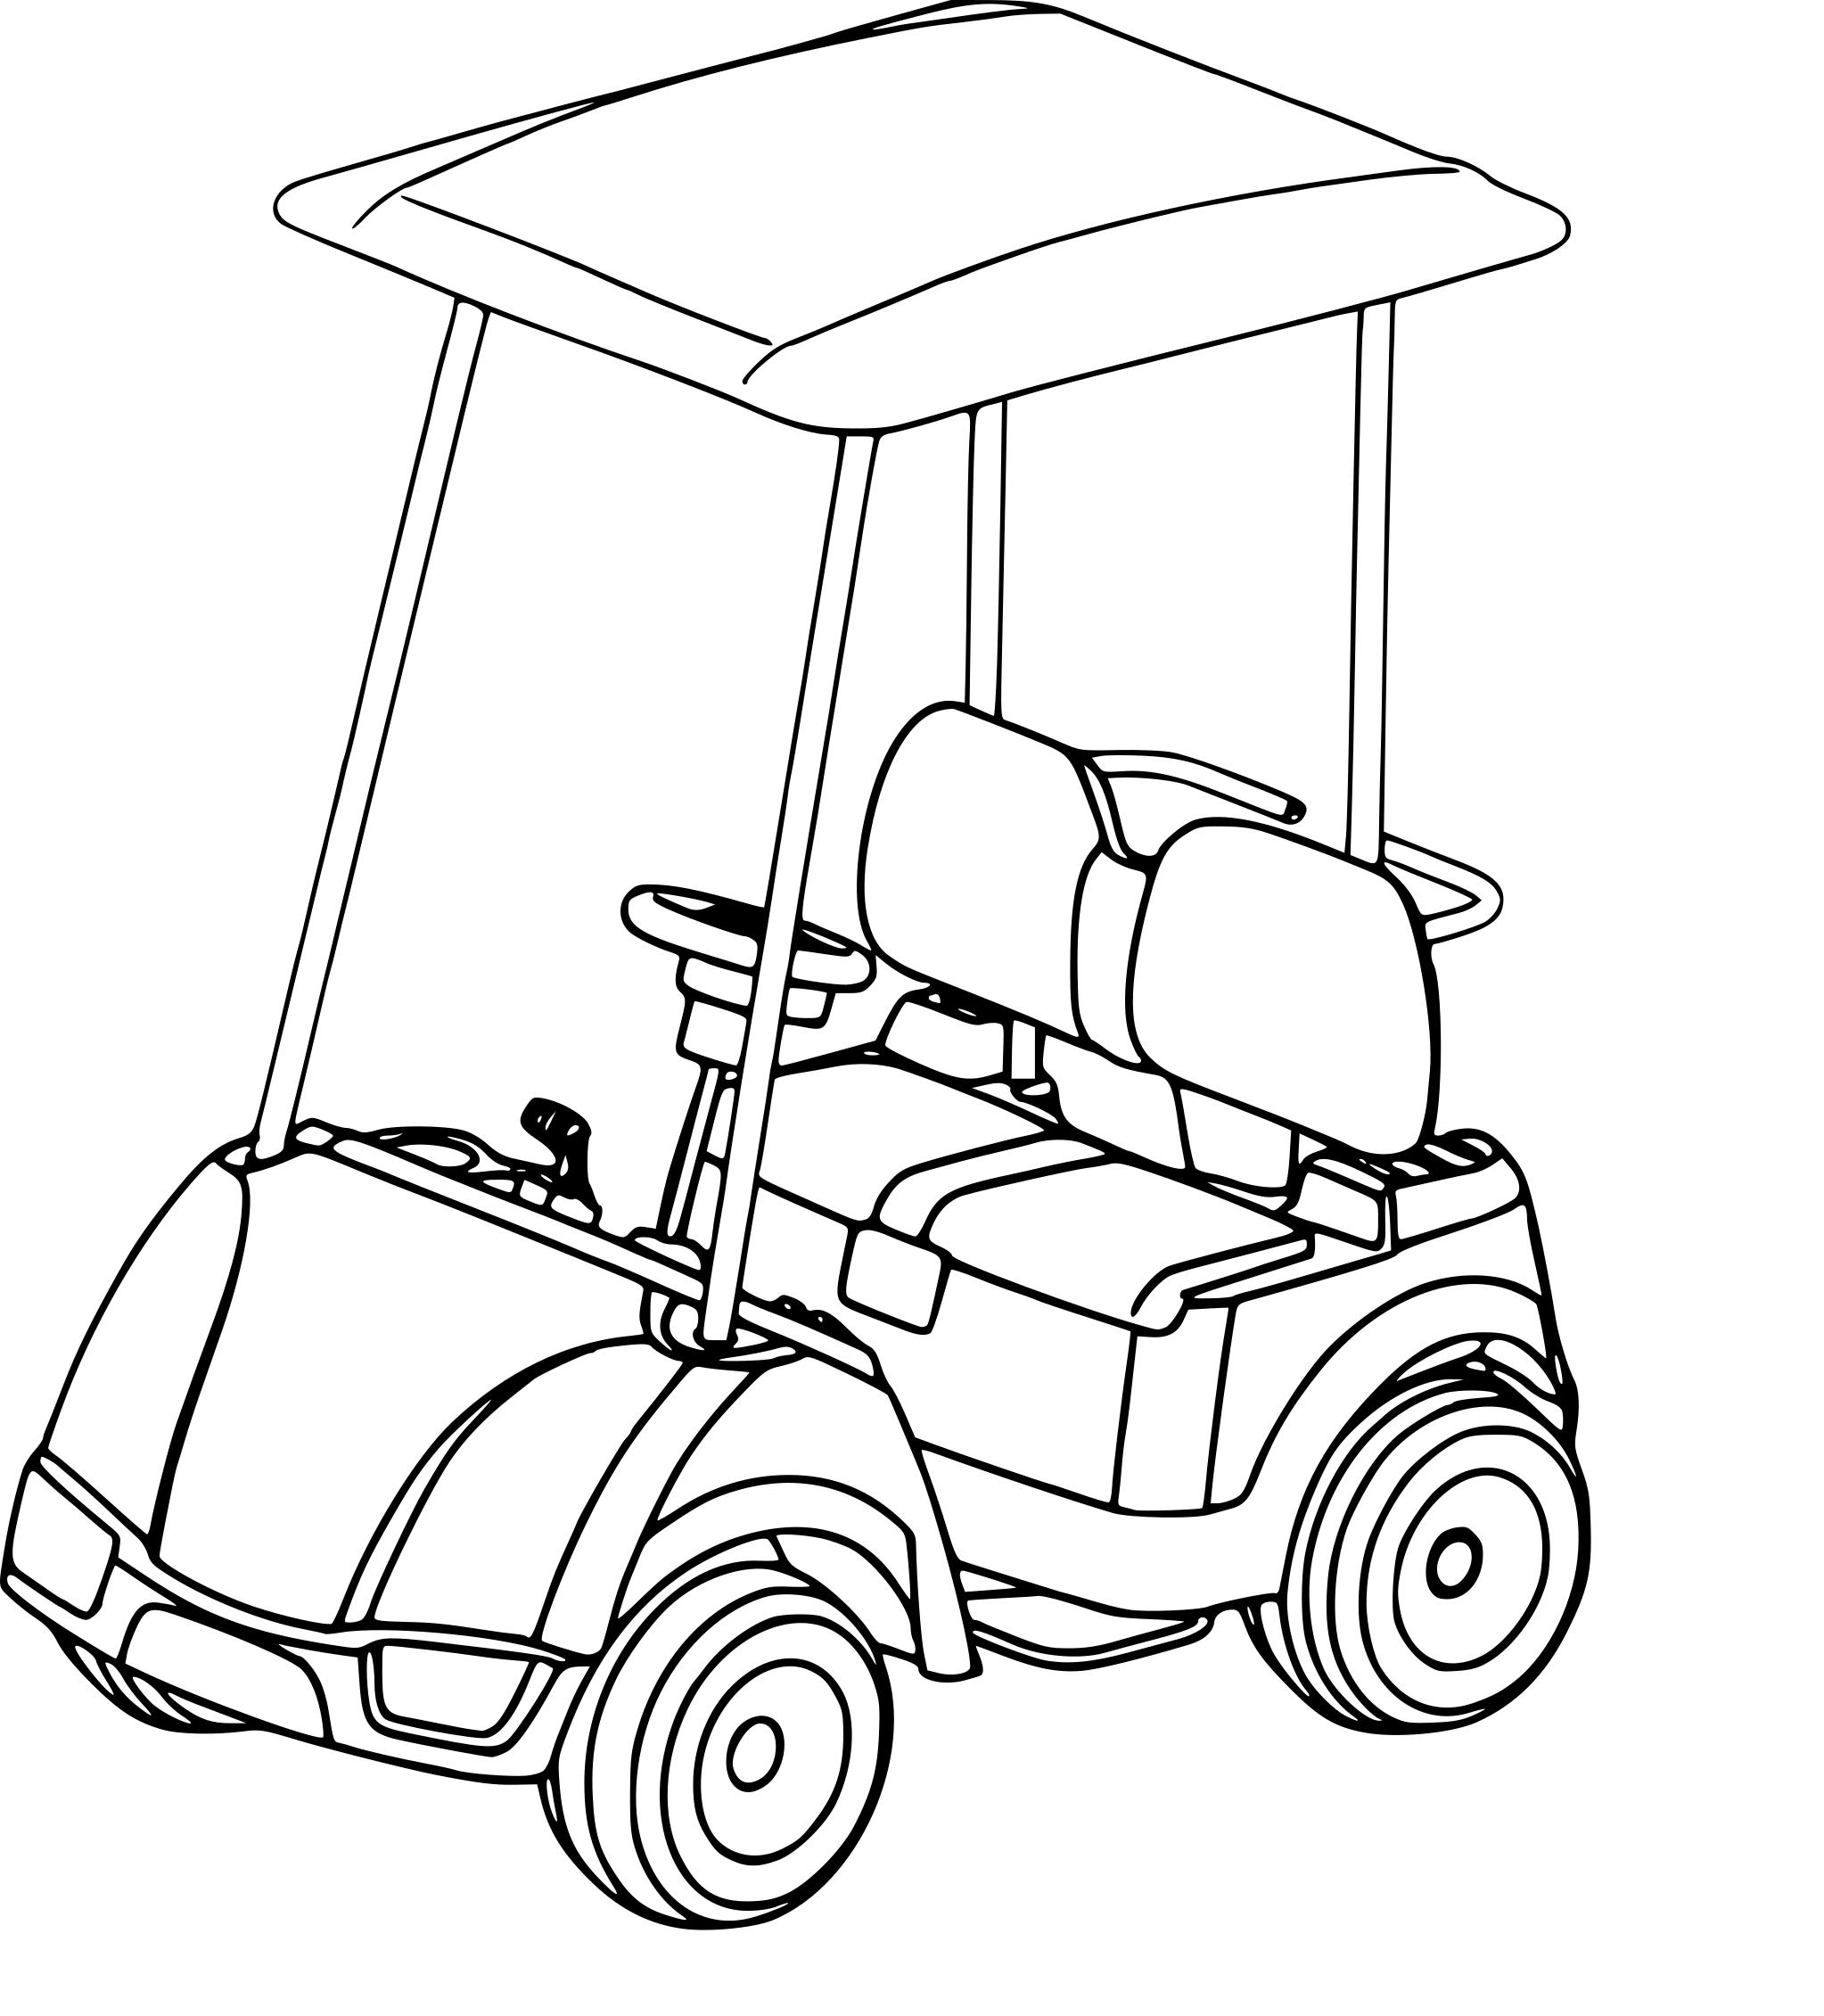 Coloriage Camion Samu.Coloriage Ambulance Samu A Imprimer